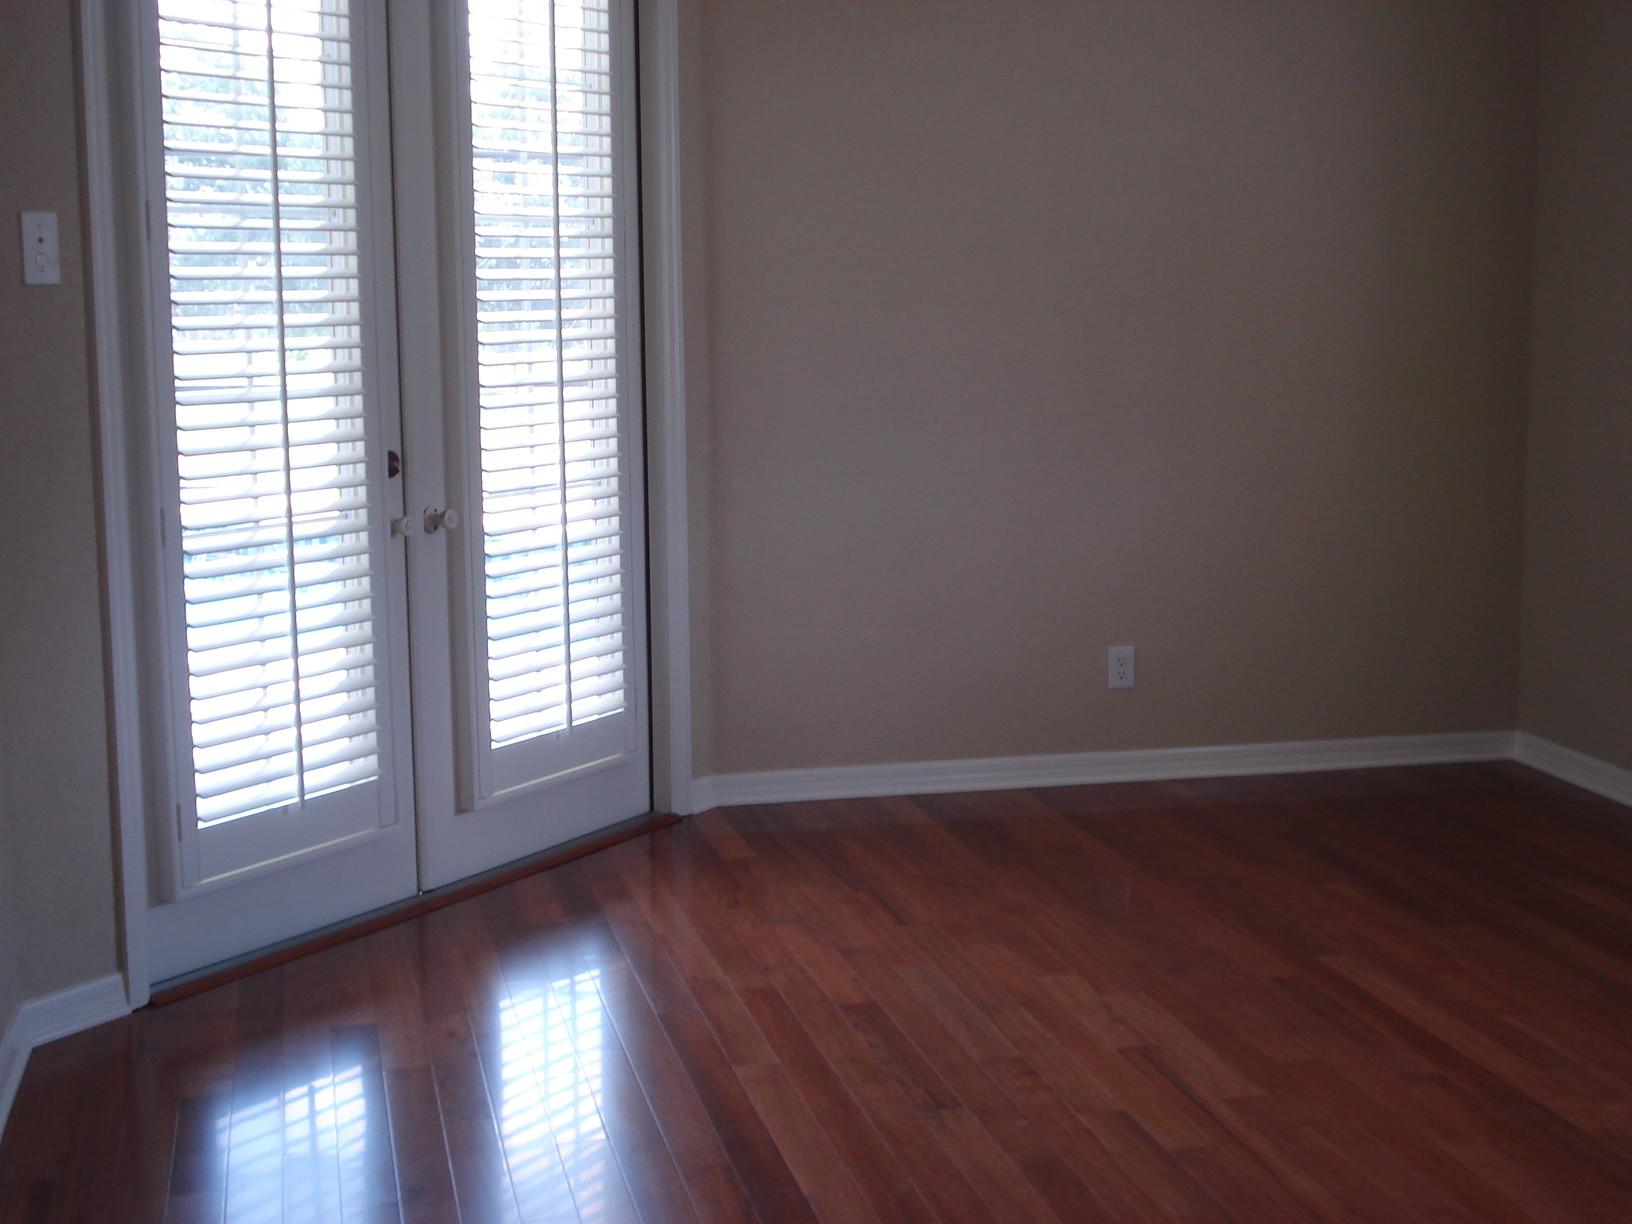 hardwood floor refinishing charlotte nc of flooring lombardos granite cabinetry flooring countertops intended for hardwood floor